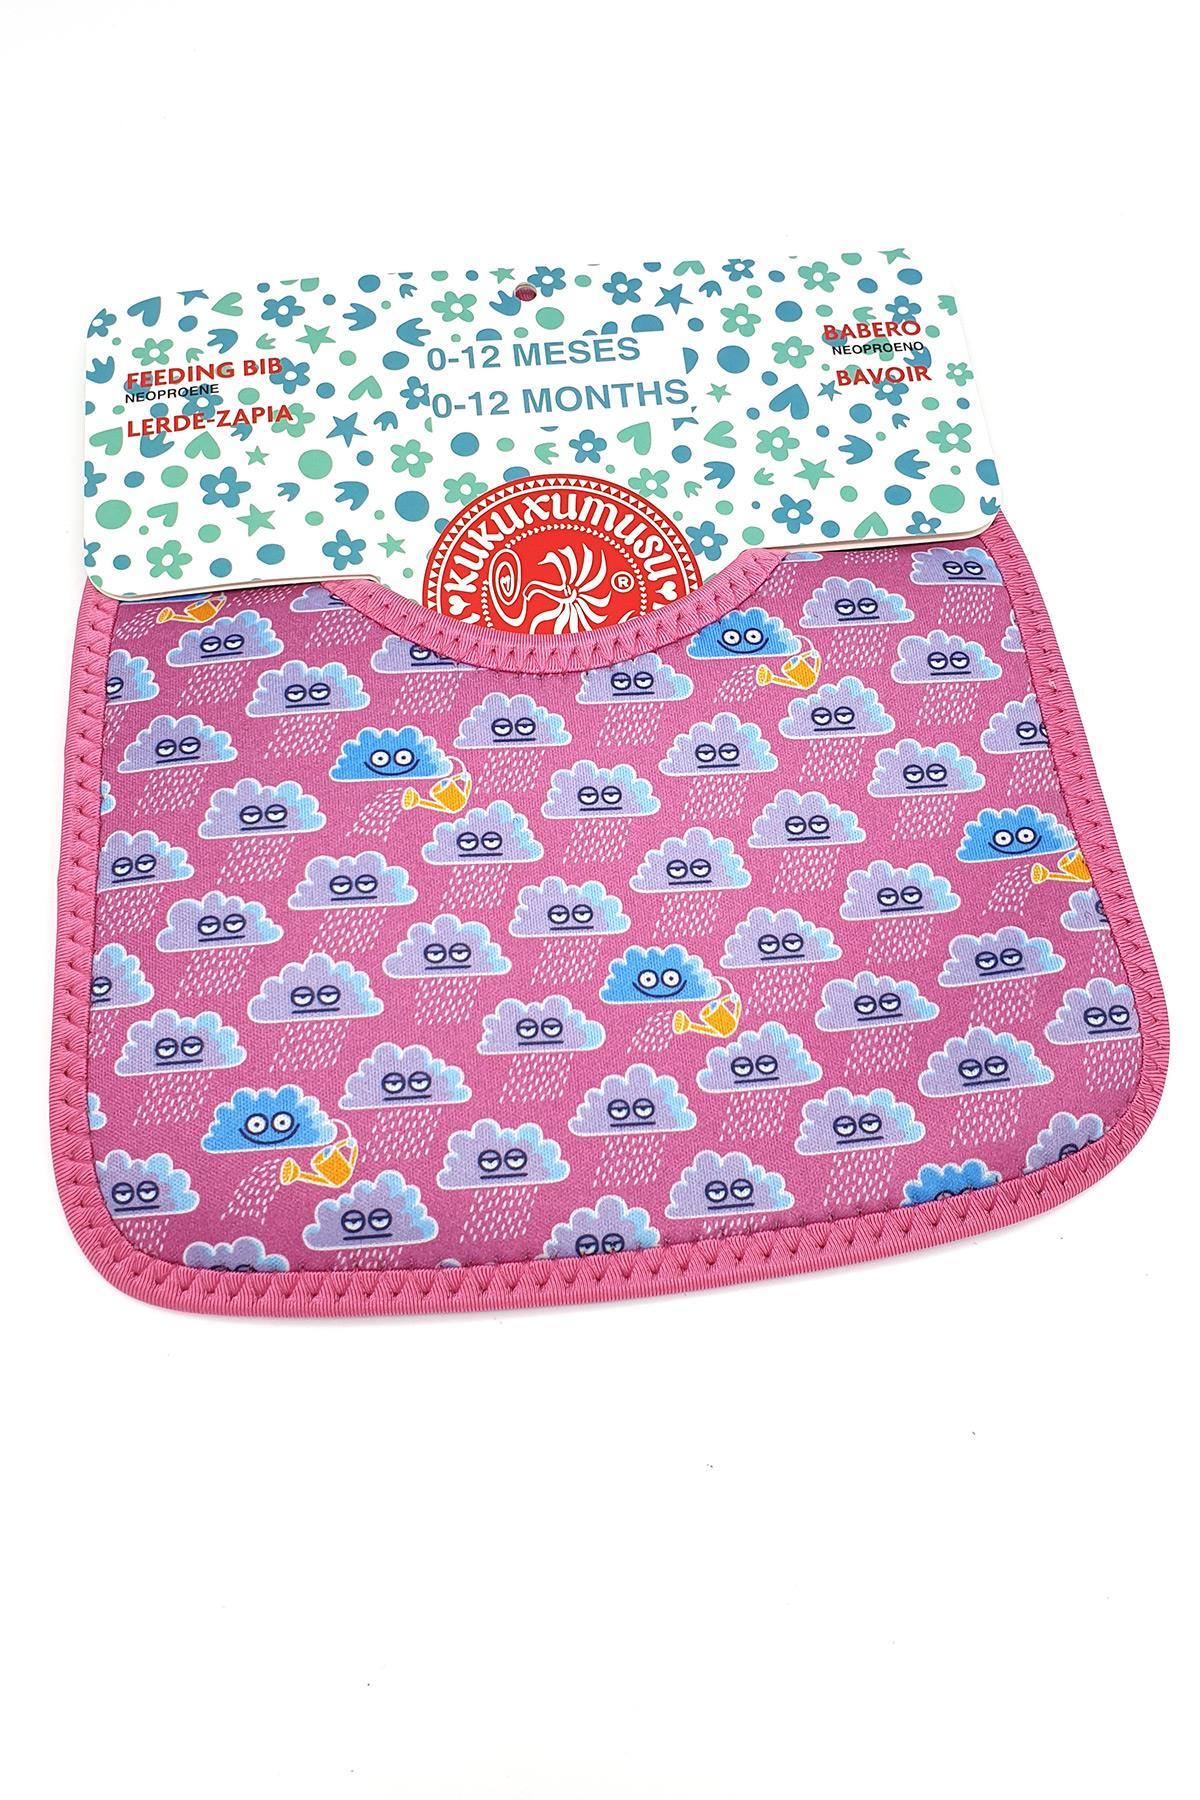 Laken İspanya Üretimi Junior 0 12 Ay Neopren Önlük Nubes Rosa Lkkbn-Cp